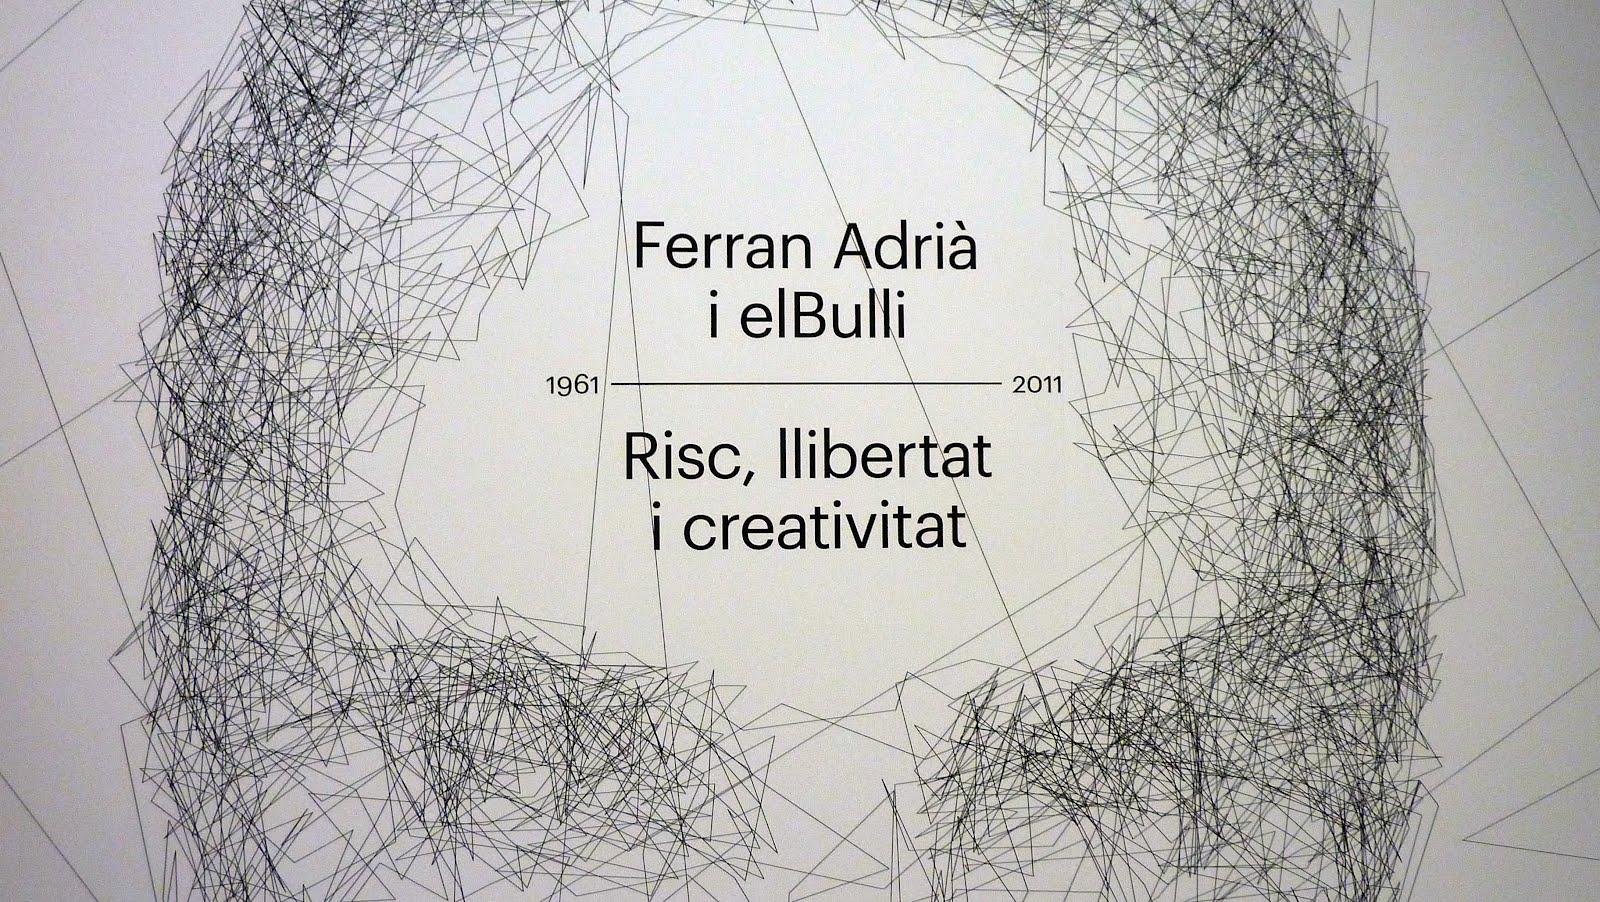 ferran-adria-el-bulli-exhibition-barcelona-portada.jpg